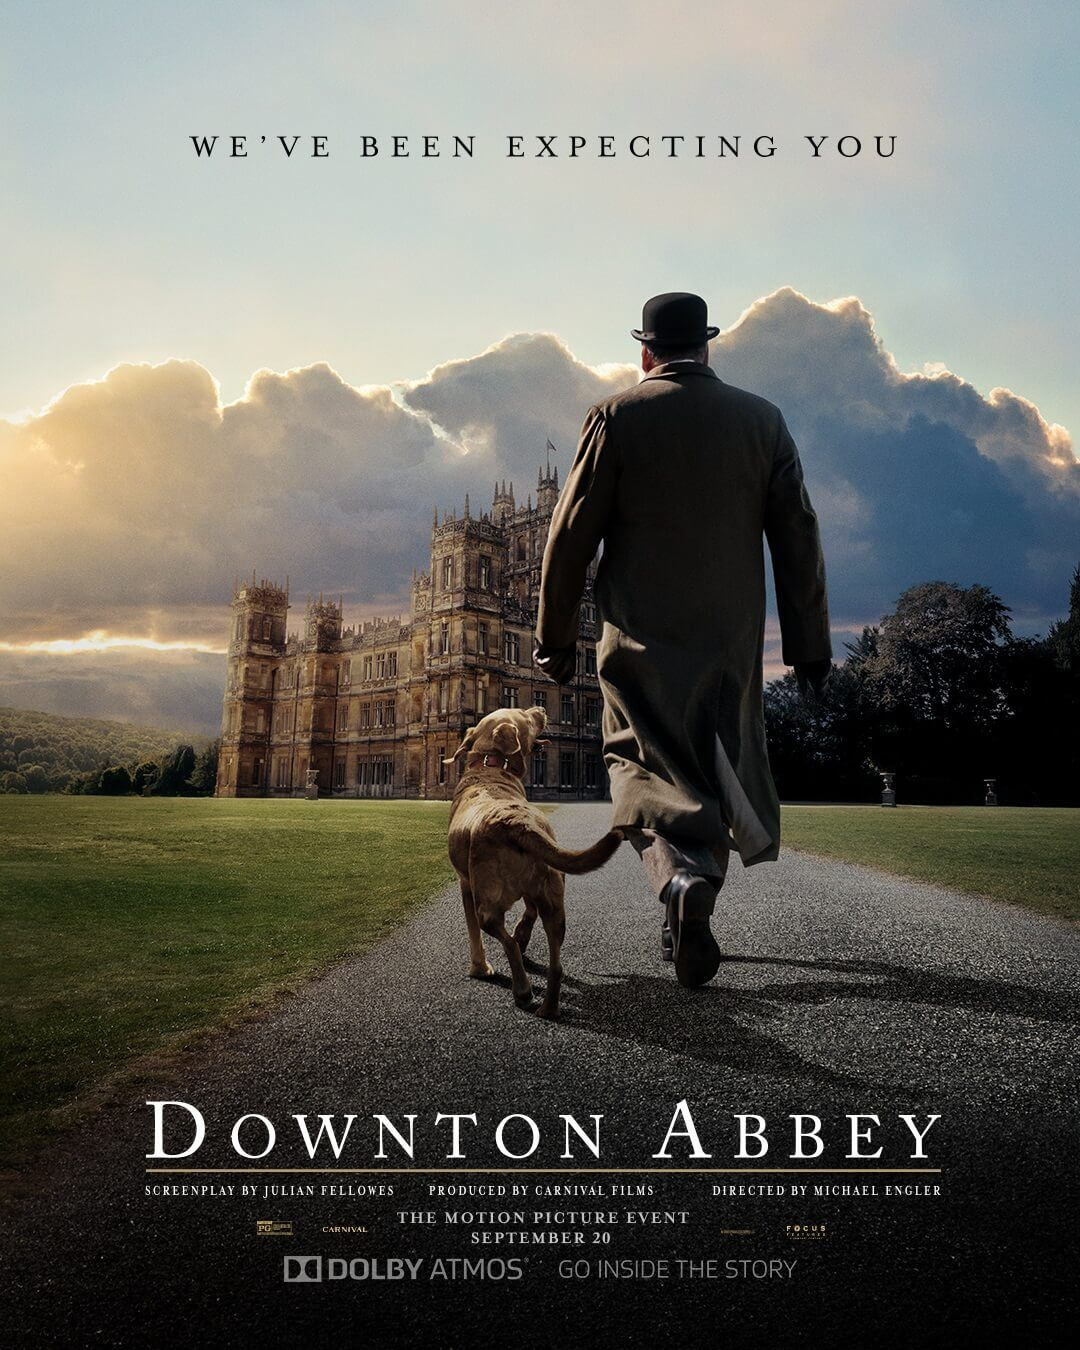 downton abbey movie 2 release date